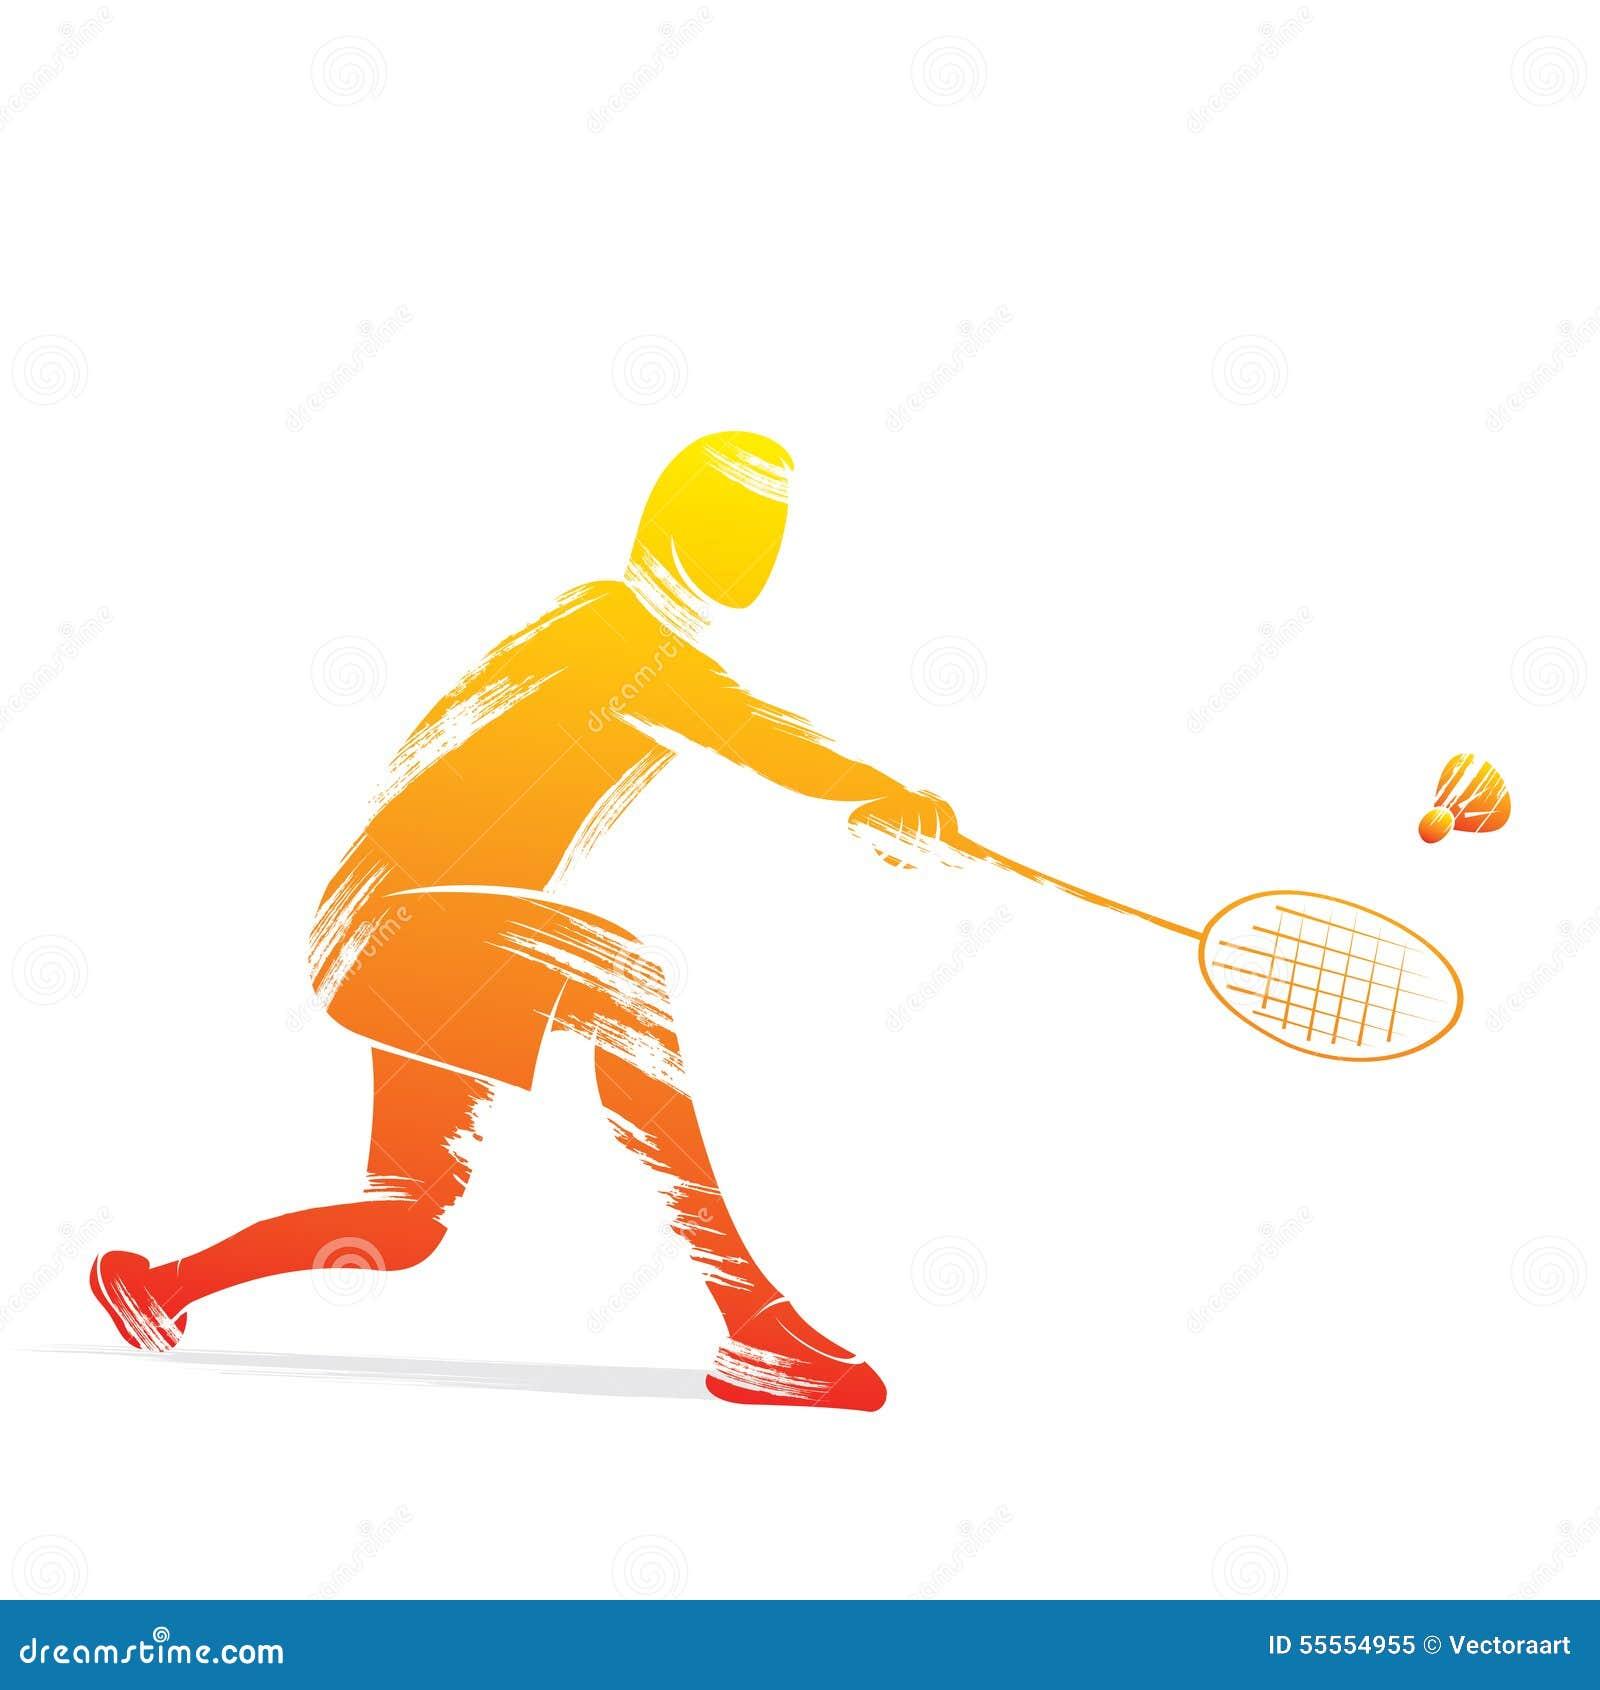 Badminton Player Design Stock Vector - Image: 55554955